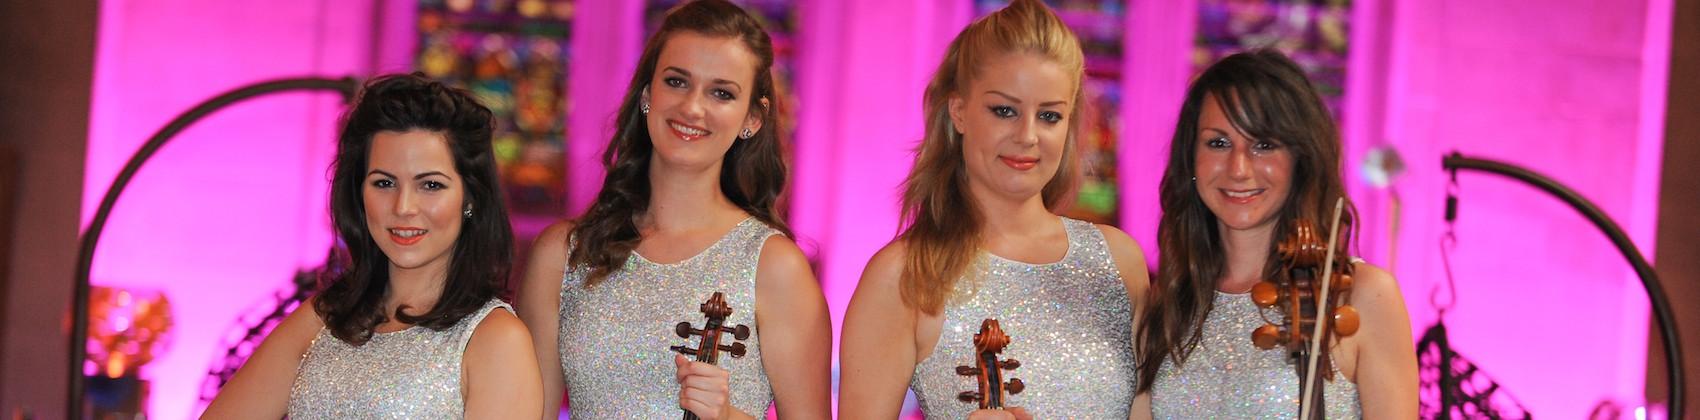 Female String Quartet Hire London   Weddings & Events